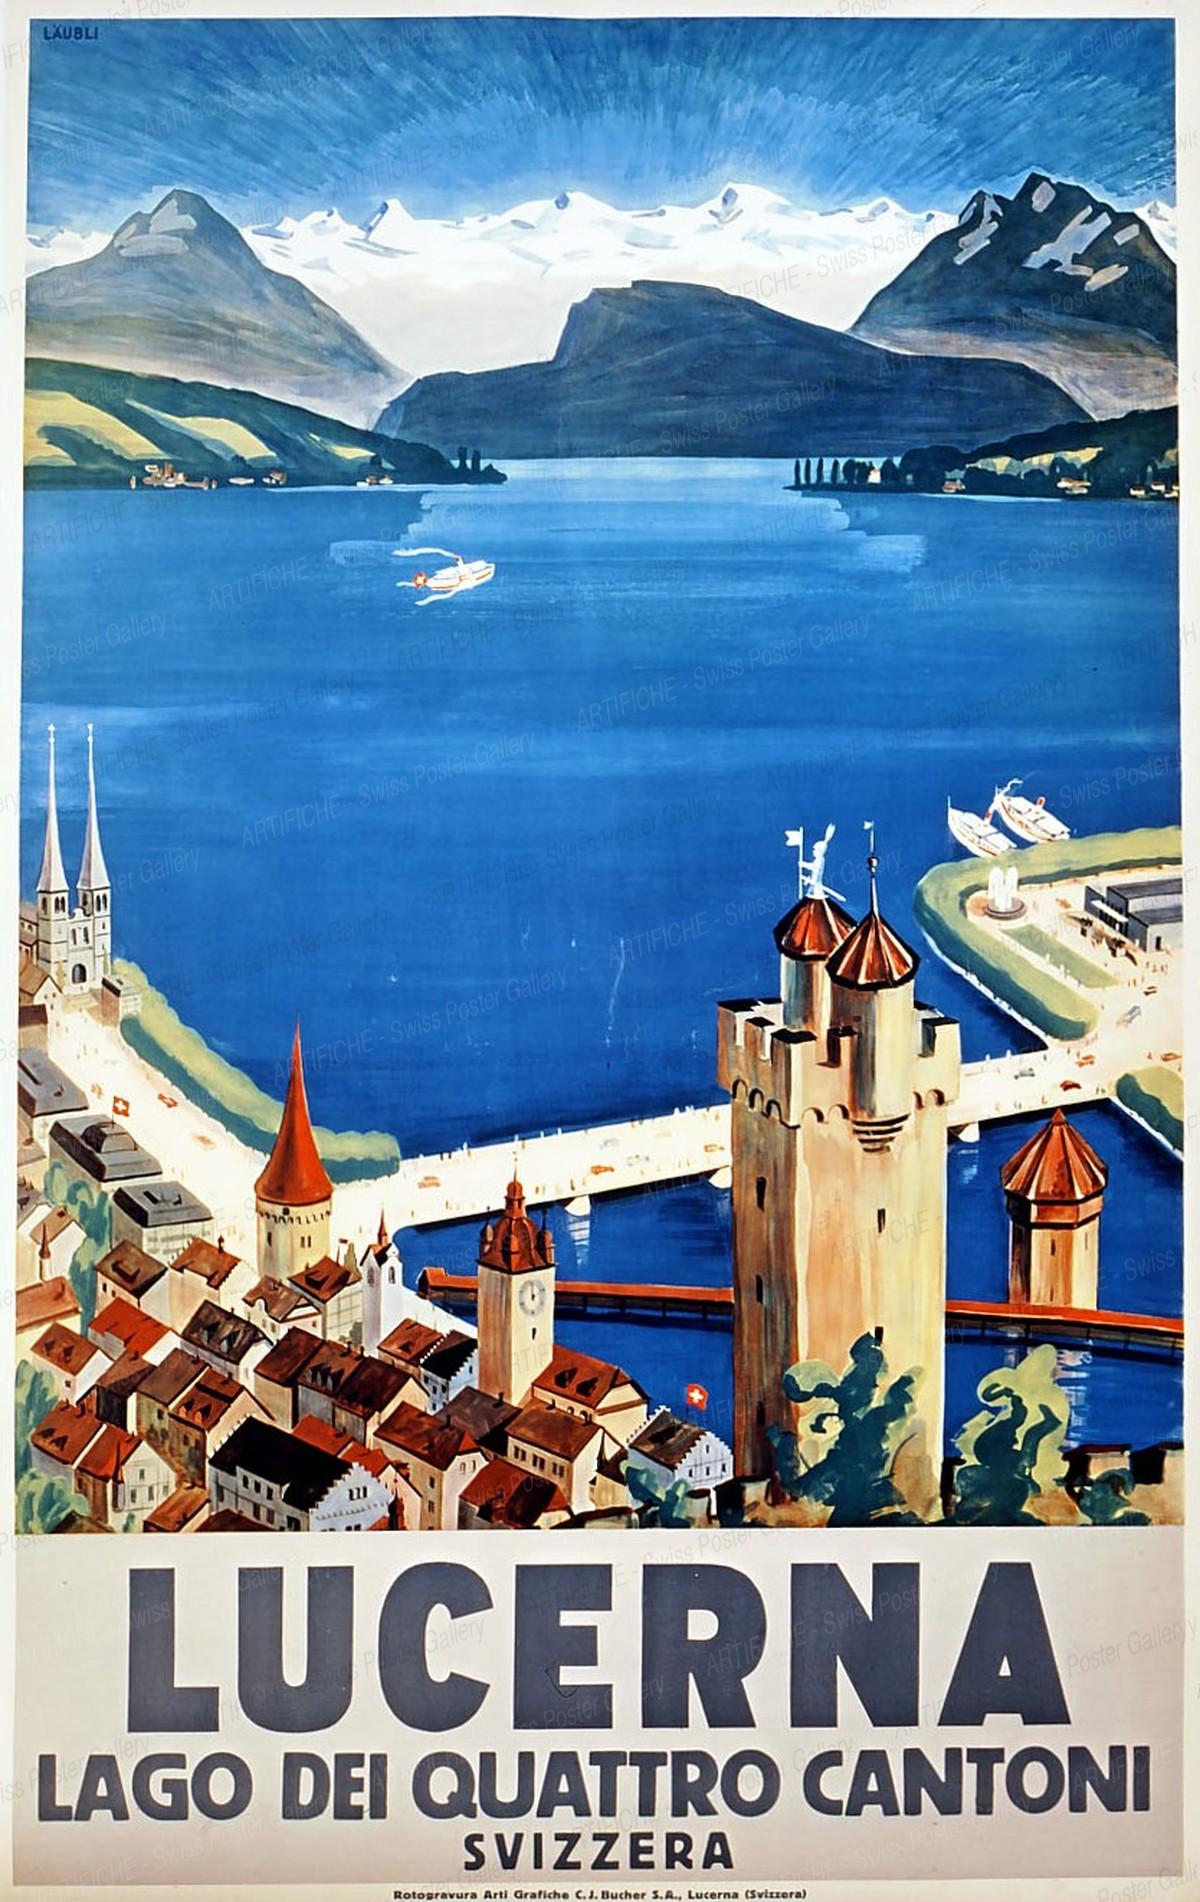 LUCERNA – Lago dei quattro cantoni – Svizzera, Otto Landolt